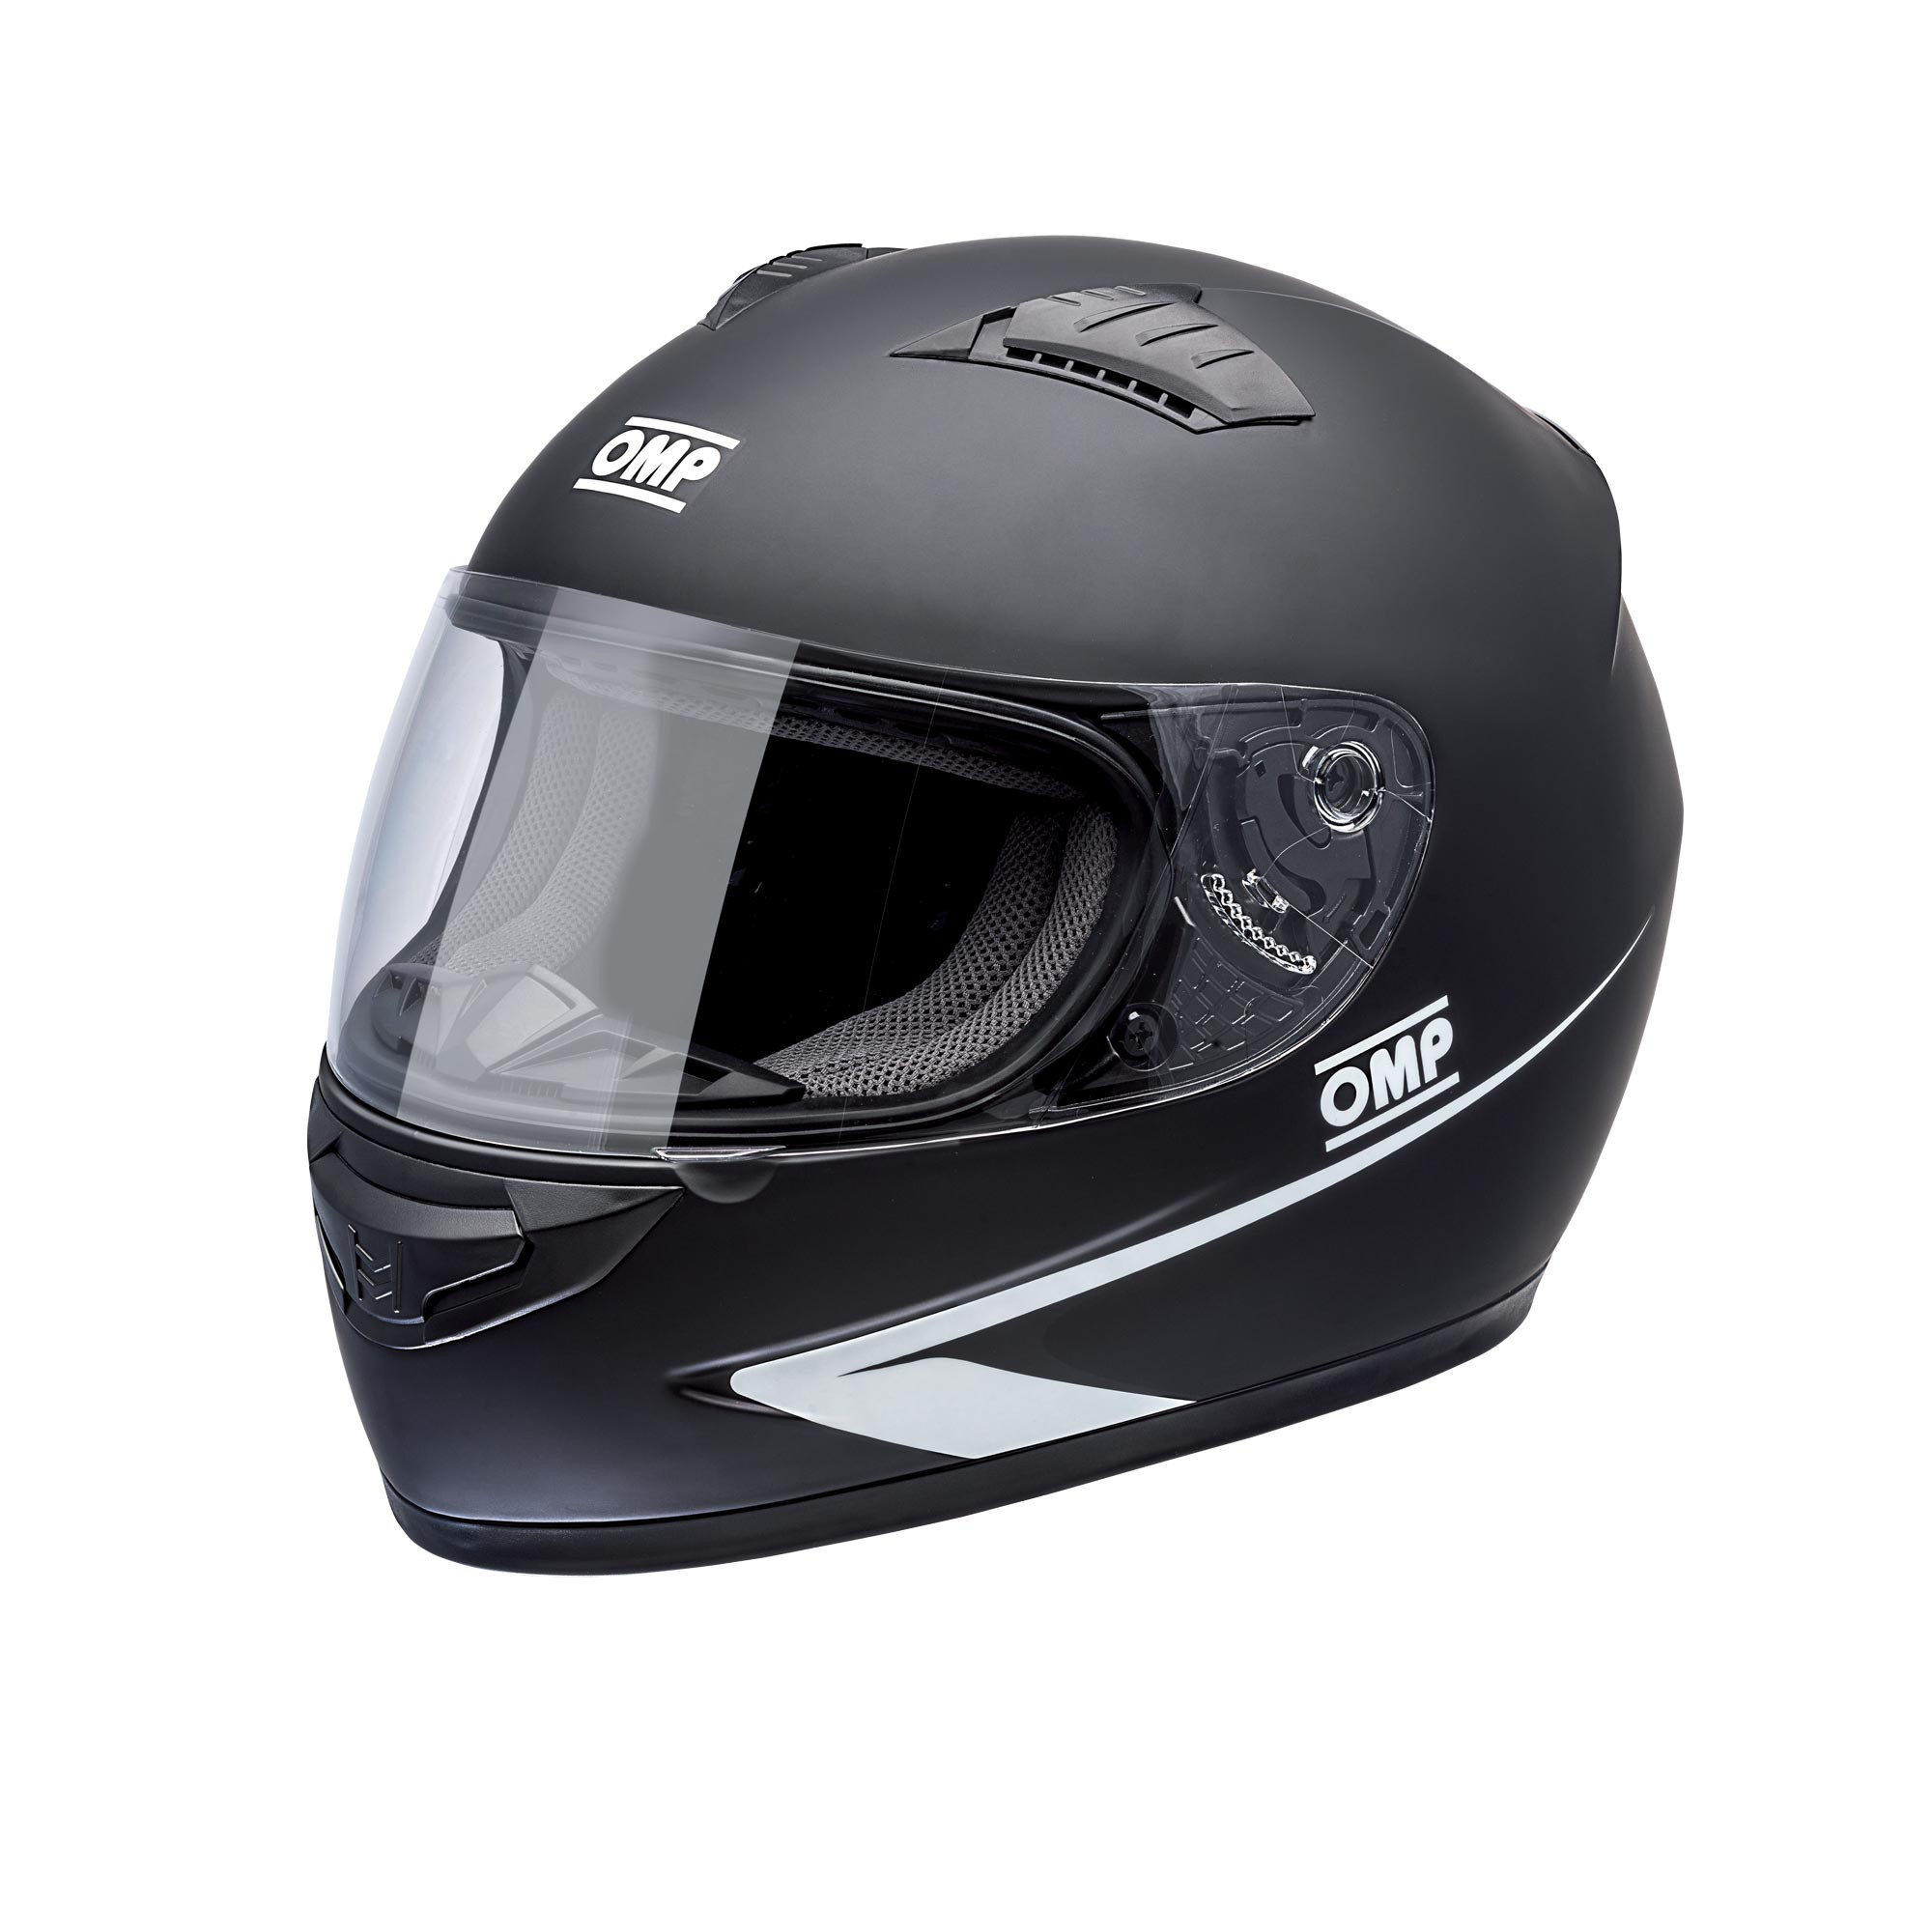 Full face helmet - CIRCUIT